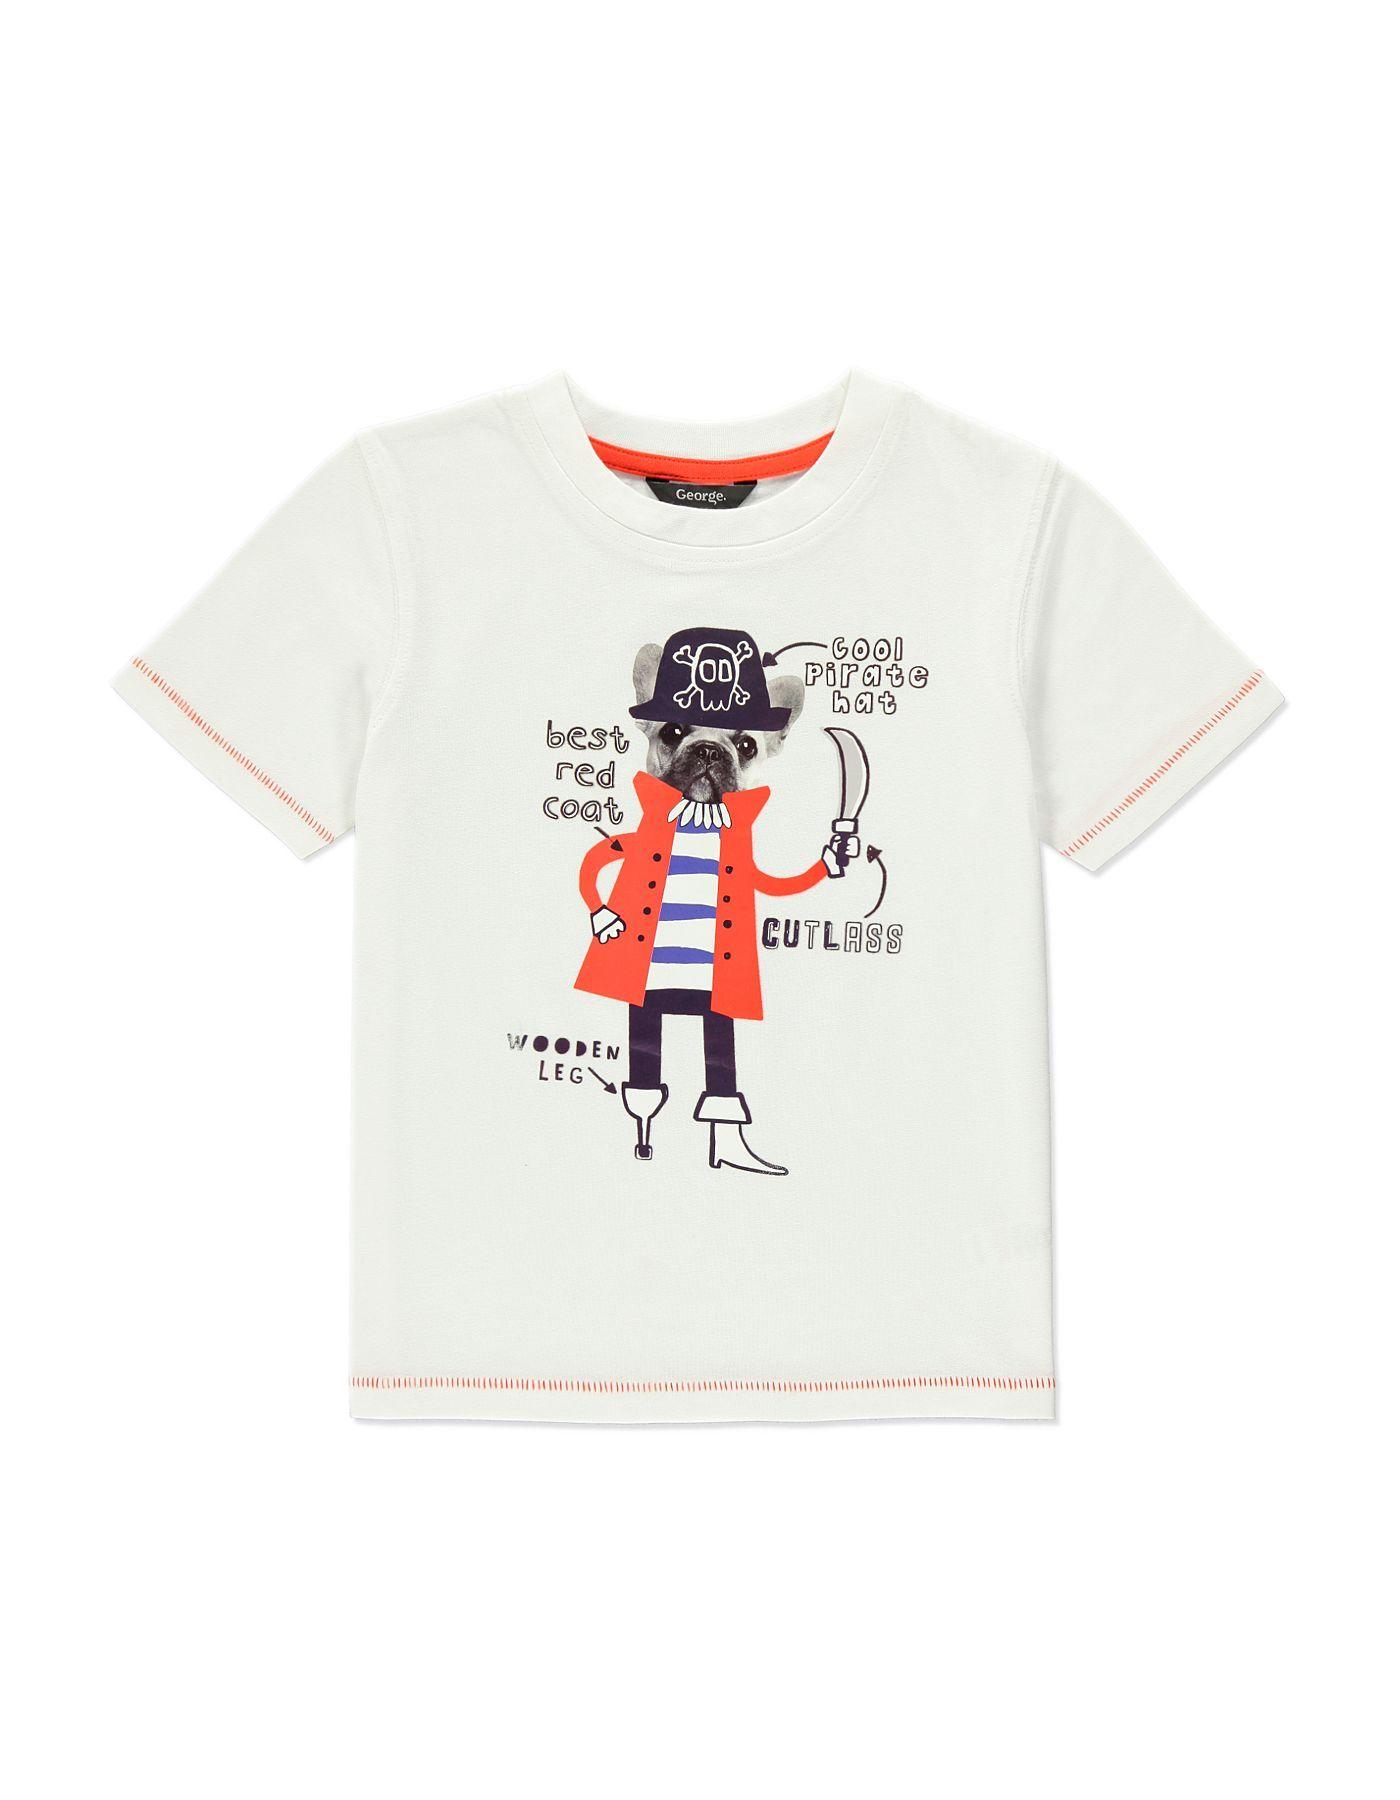 Black t shirt asda - Babies Pirate Dog T Shirt